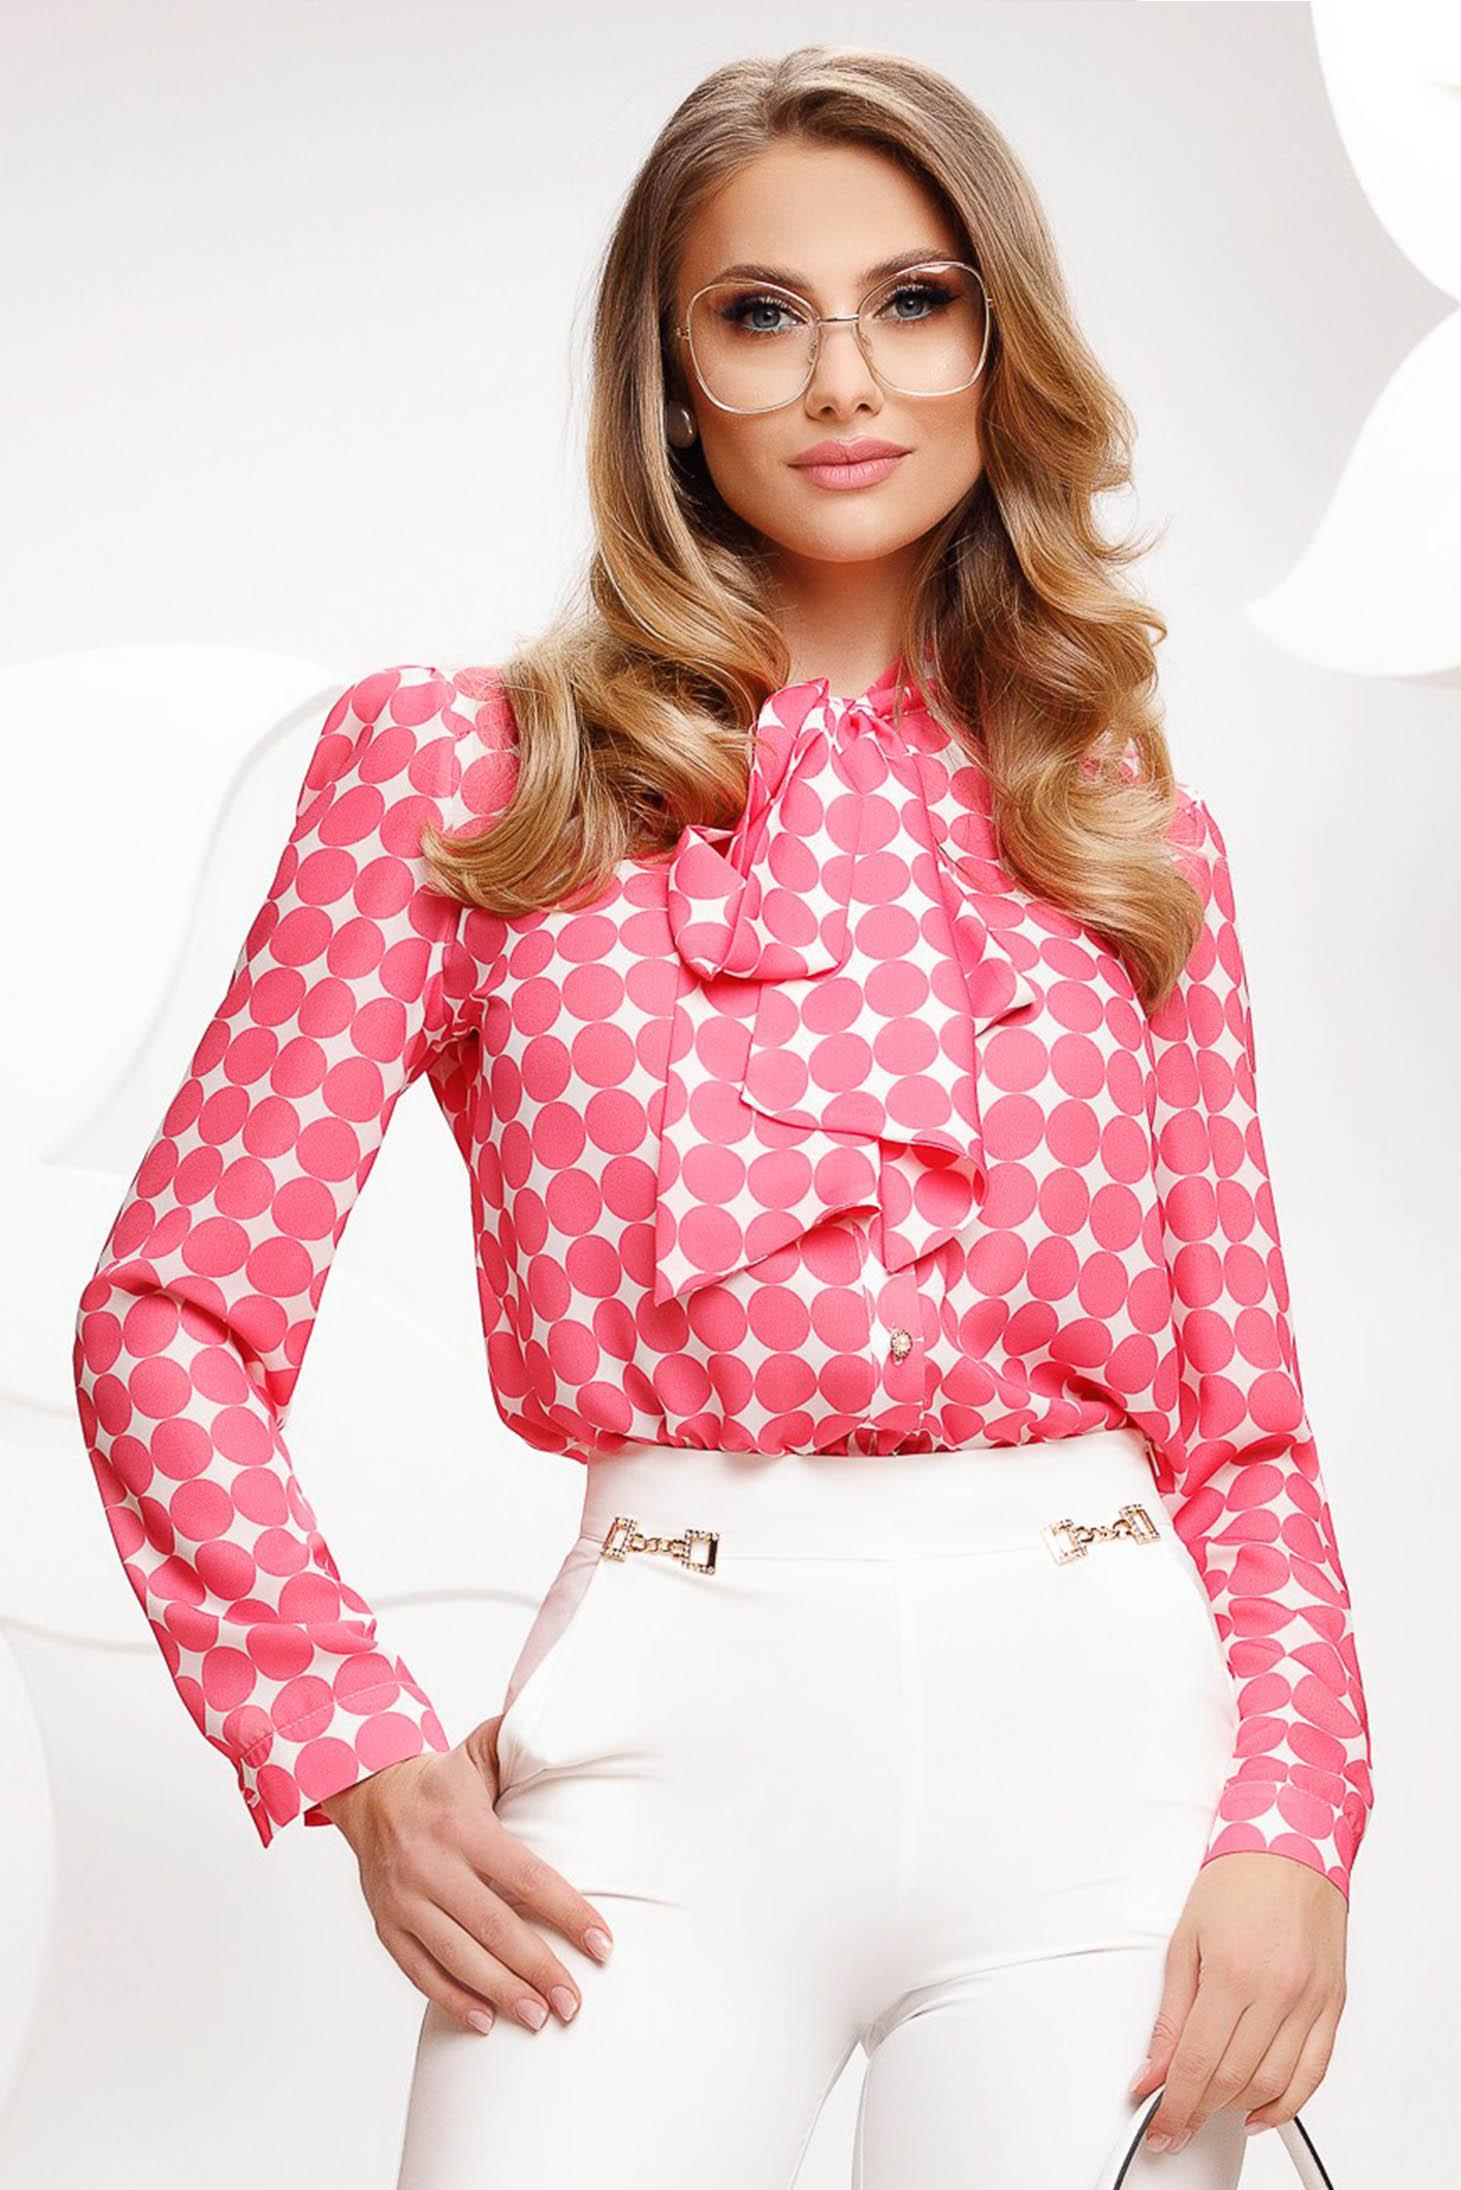 Bluza dama Fofy roz cu buline din voal cu croi larg care se leaga cu fundita